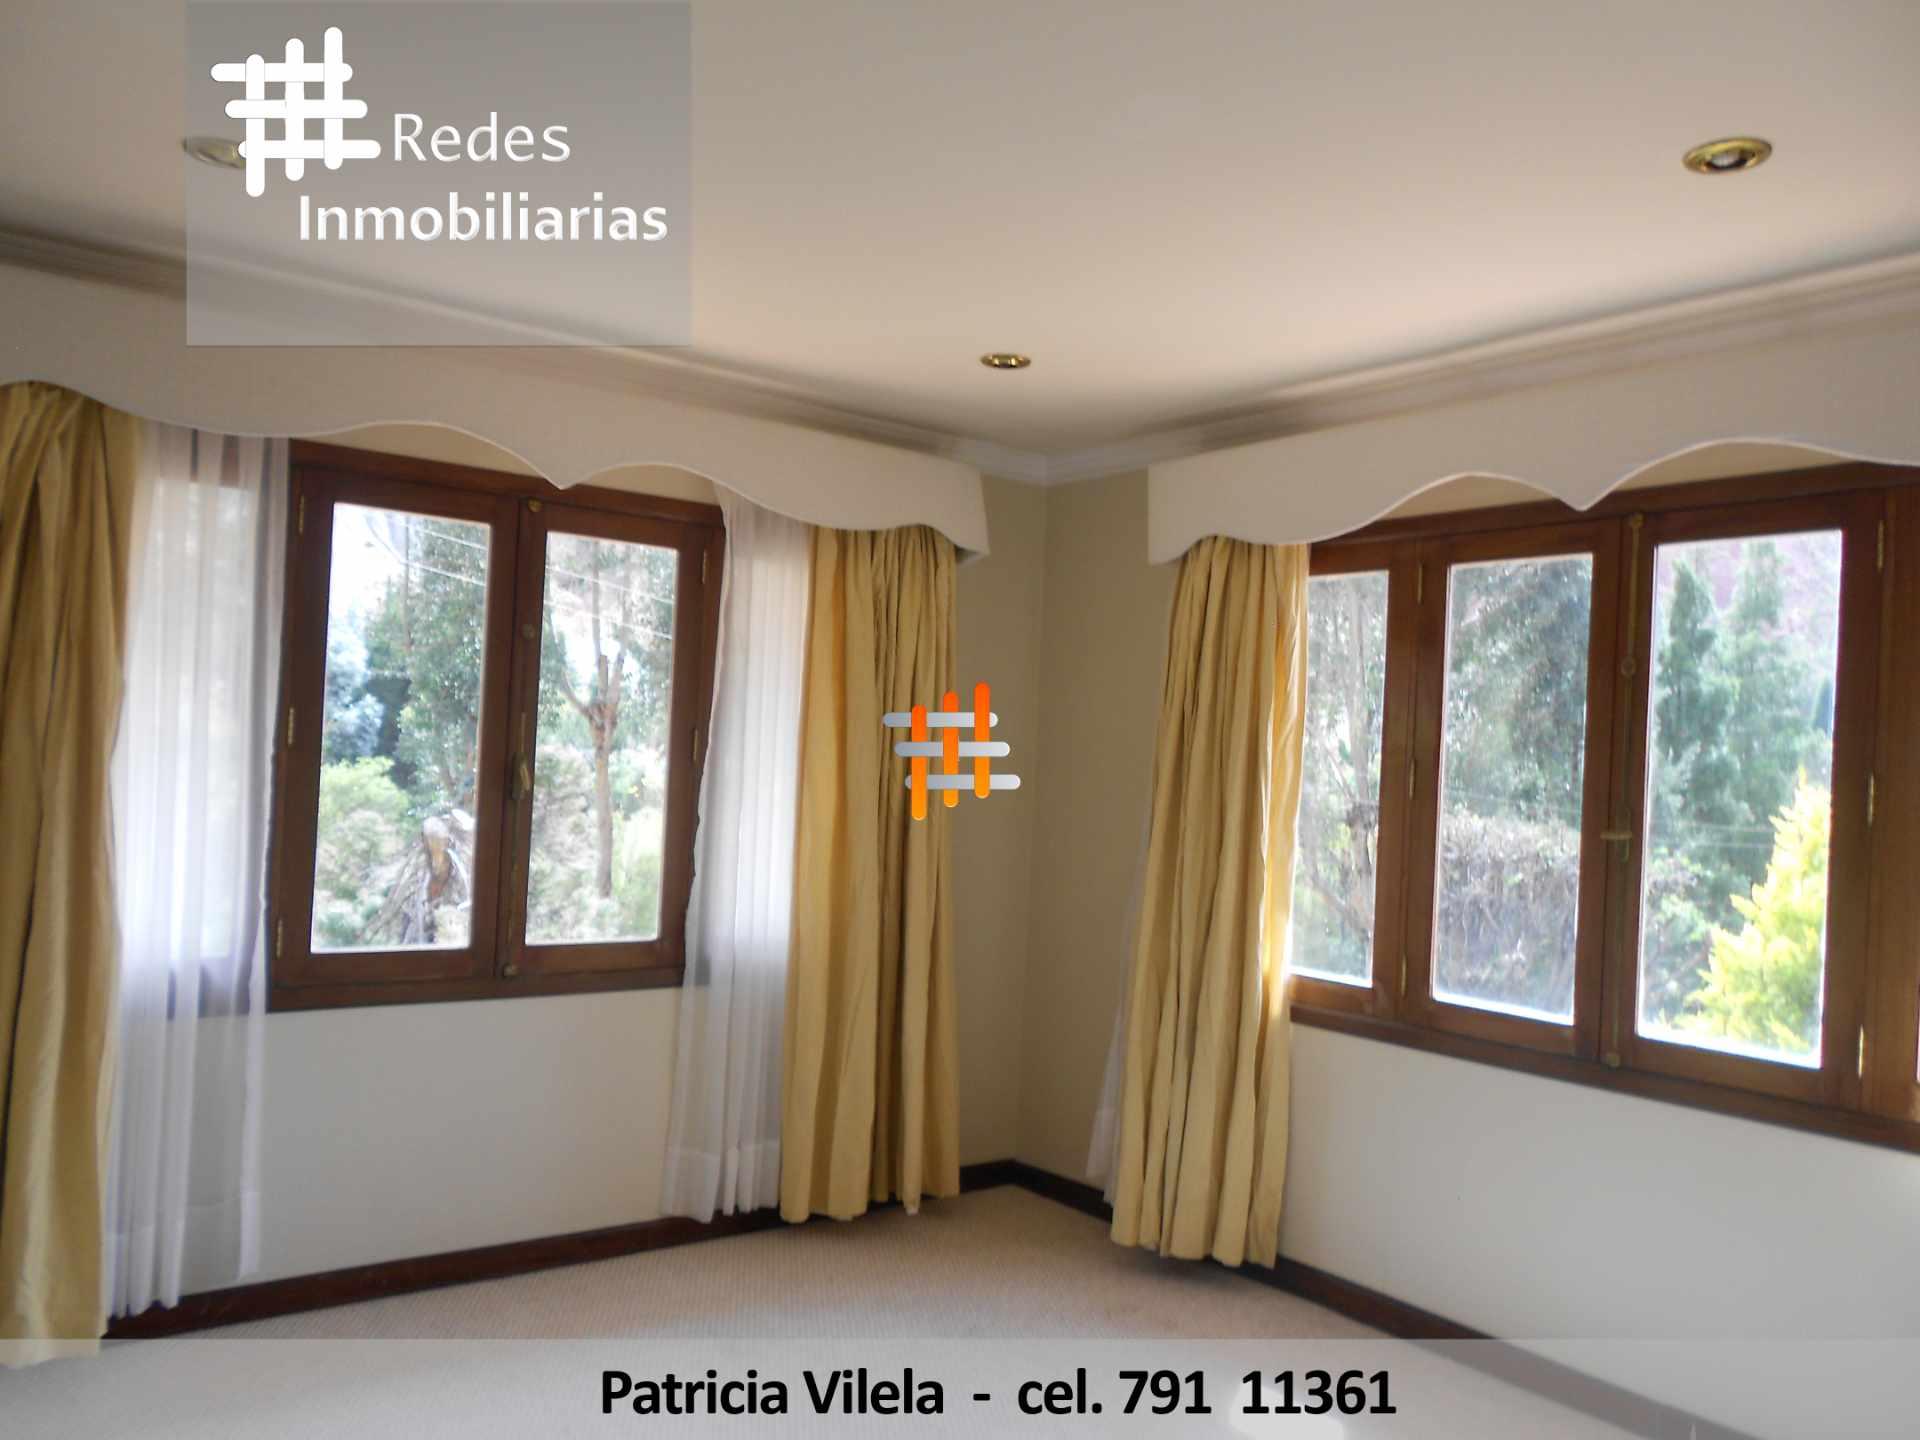 Casa en Alquiler HERMOSA RESIDENCIA EN ALQUILER  ...ARANJUEZ Foto 15